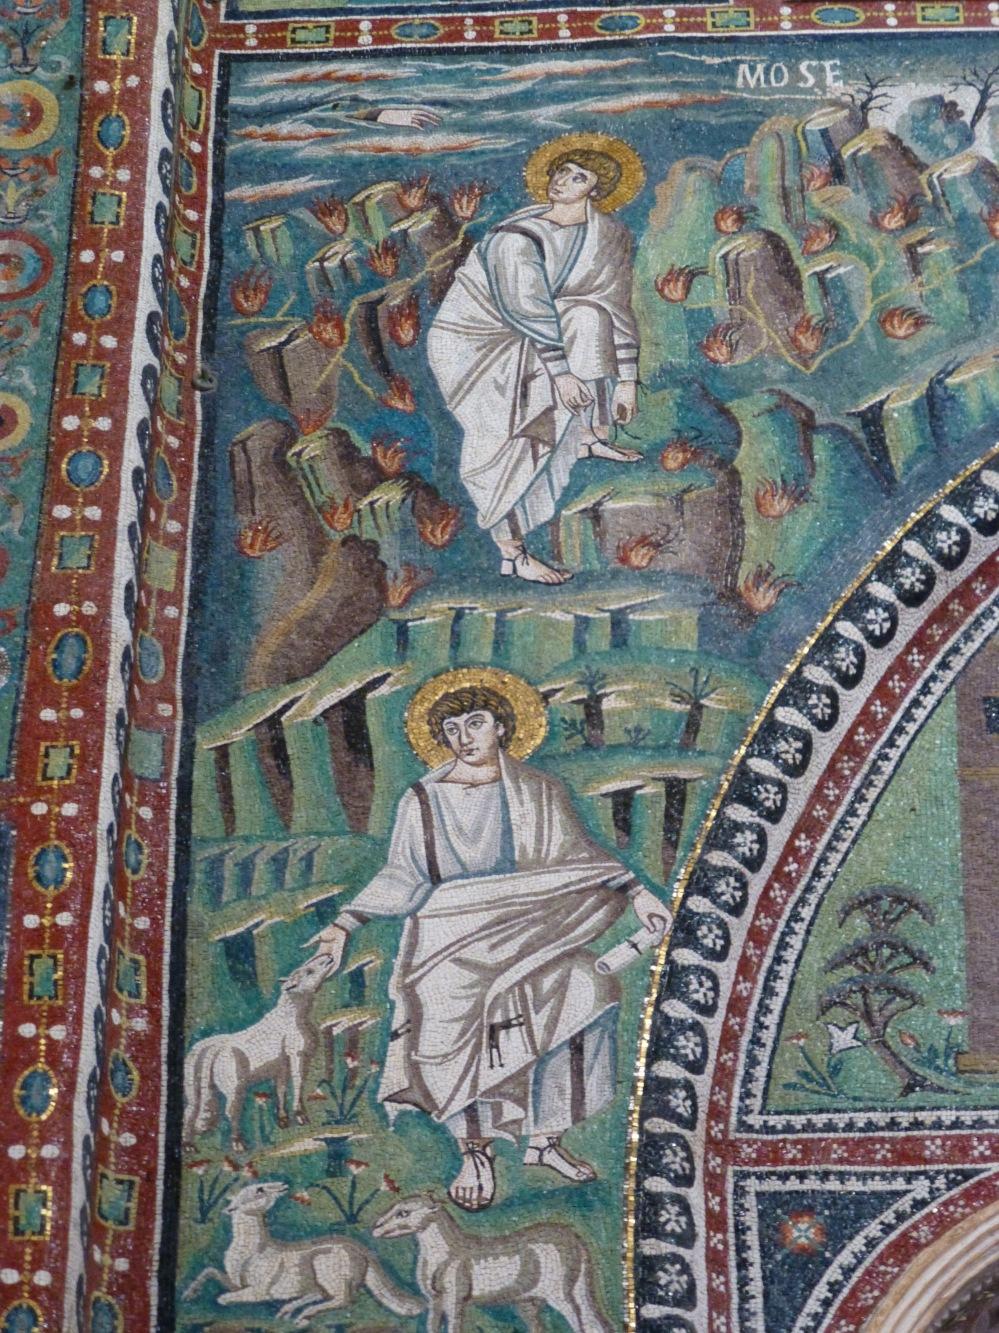 Moses as a shepherd and Moses and the burning bush, mosaics, San Vitale, Ravenna